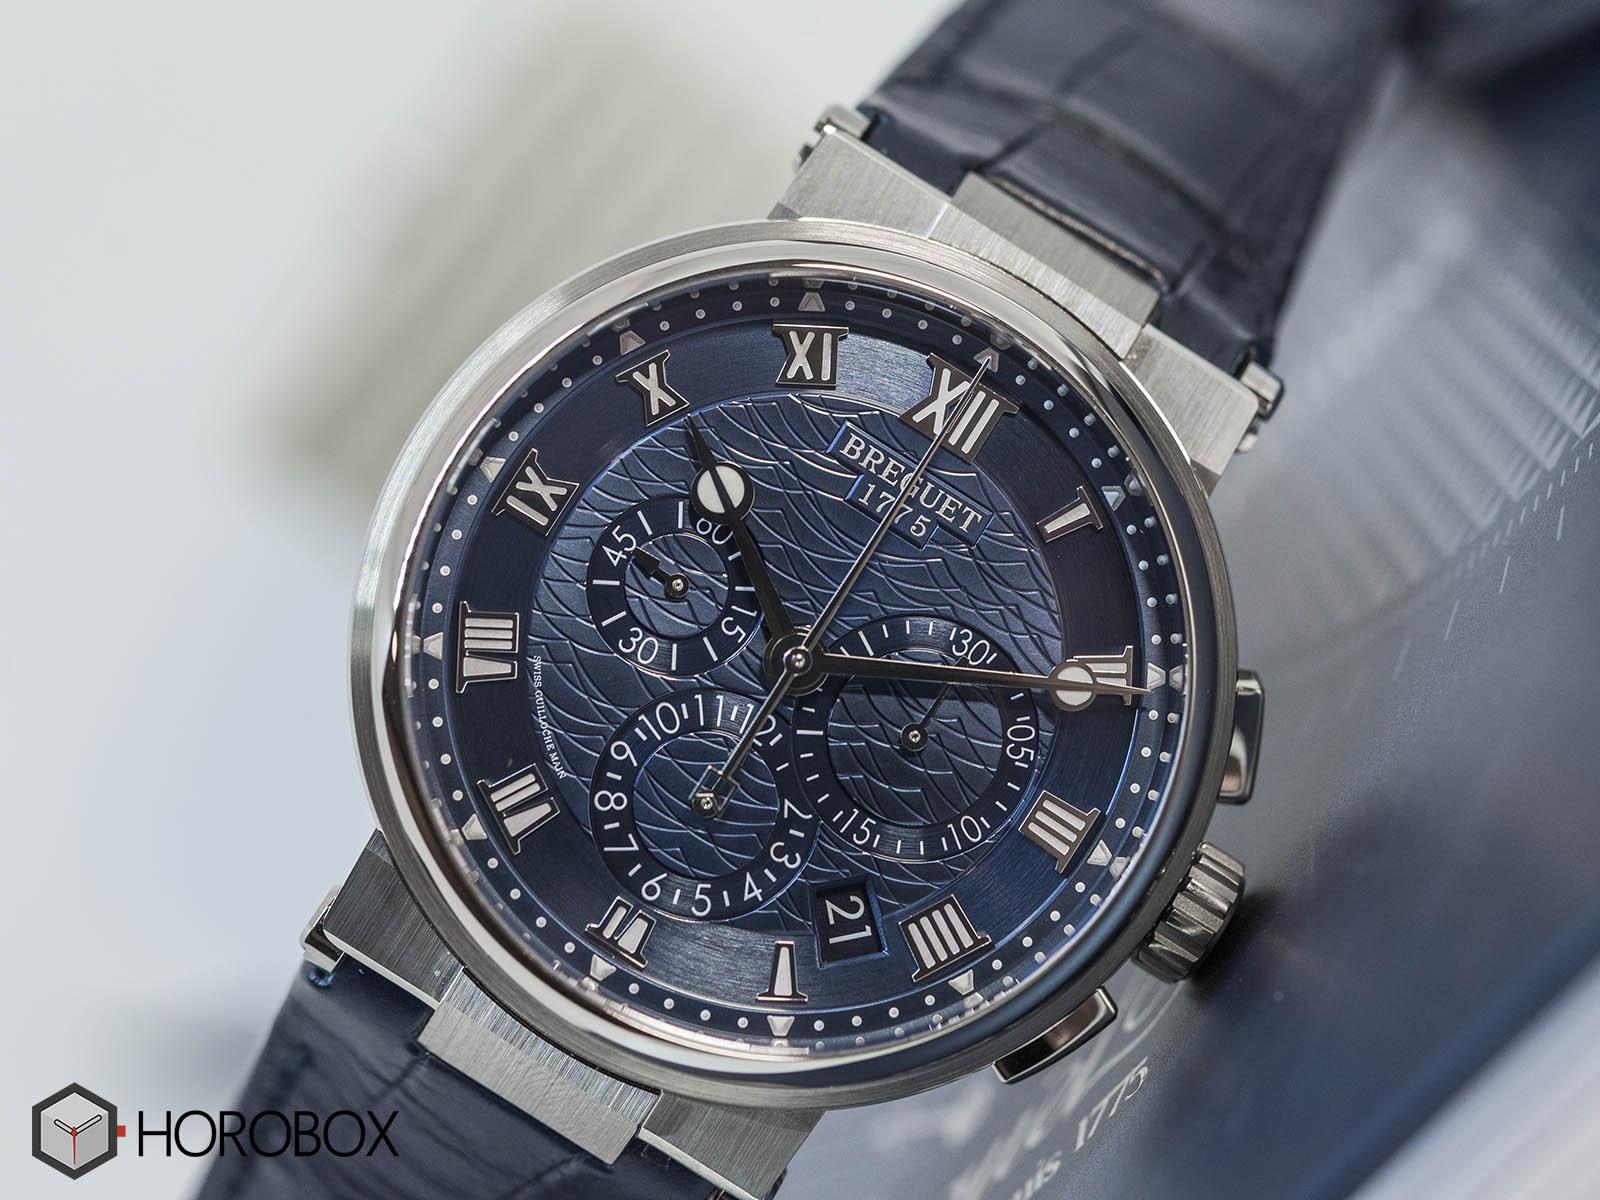 5527-breguet-marine-chronograph-4.jpg